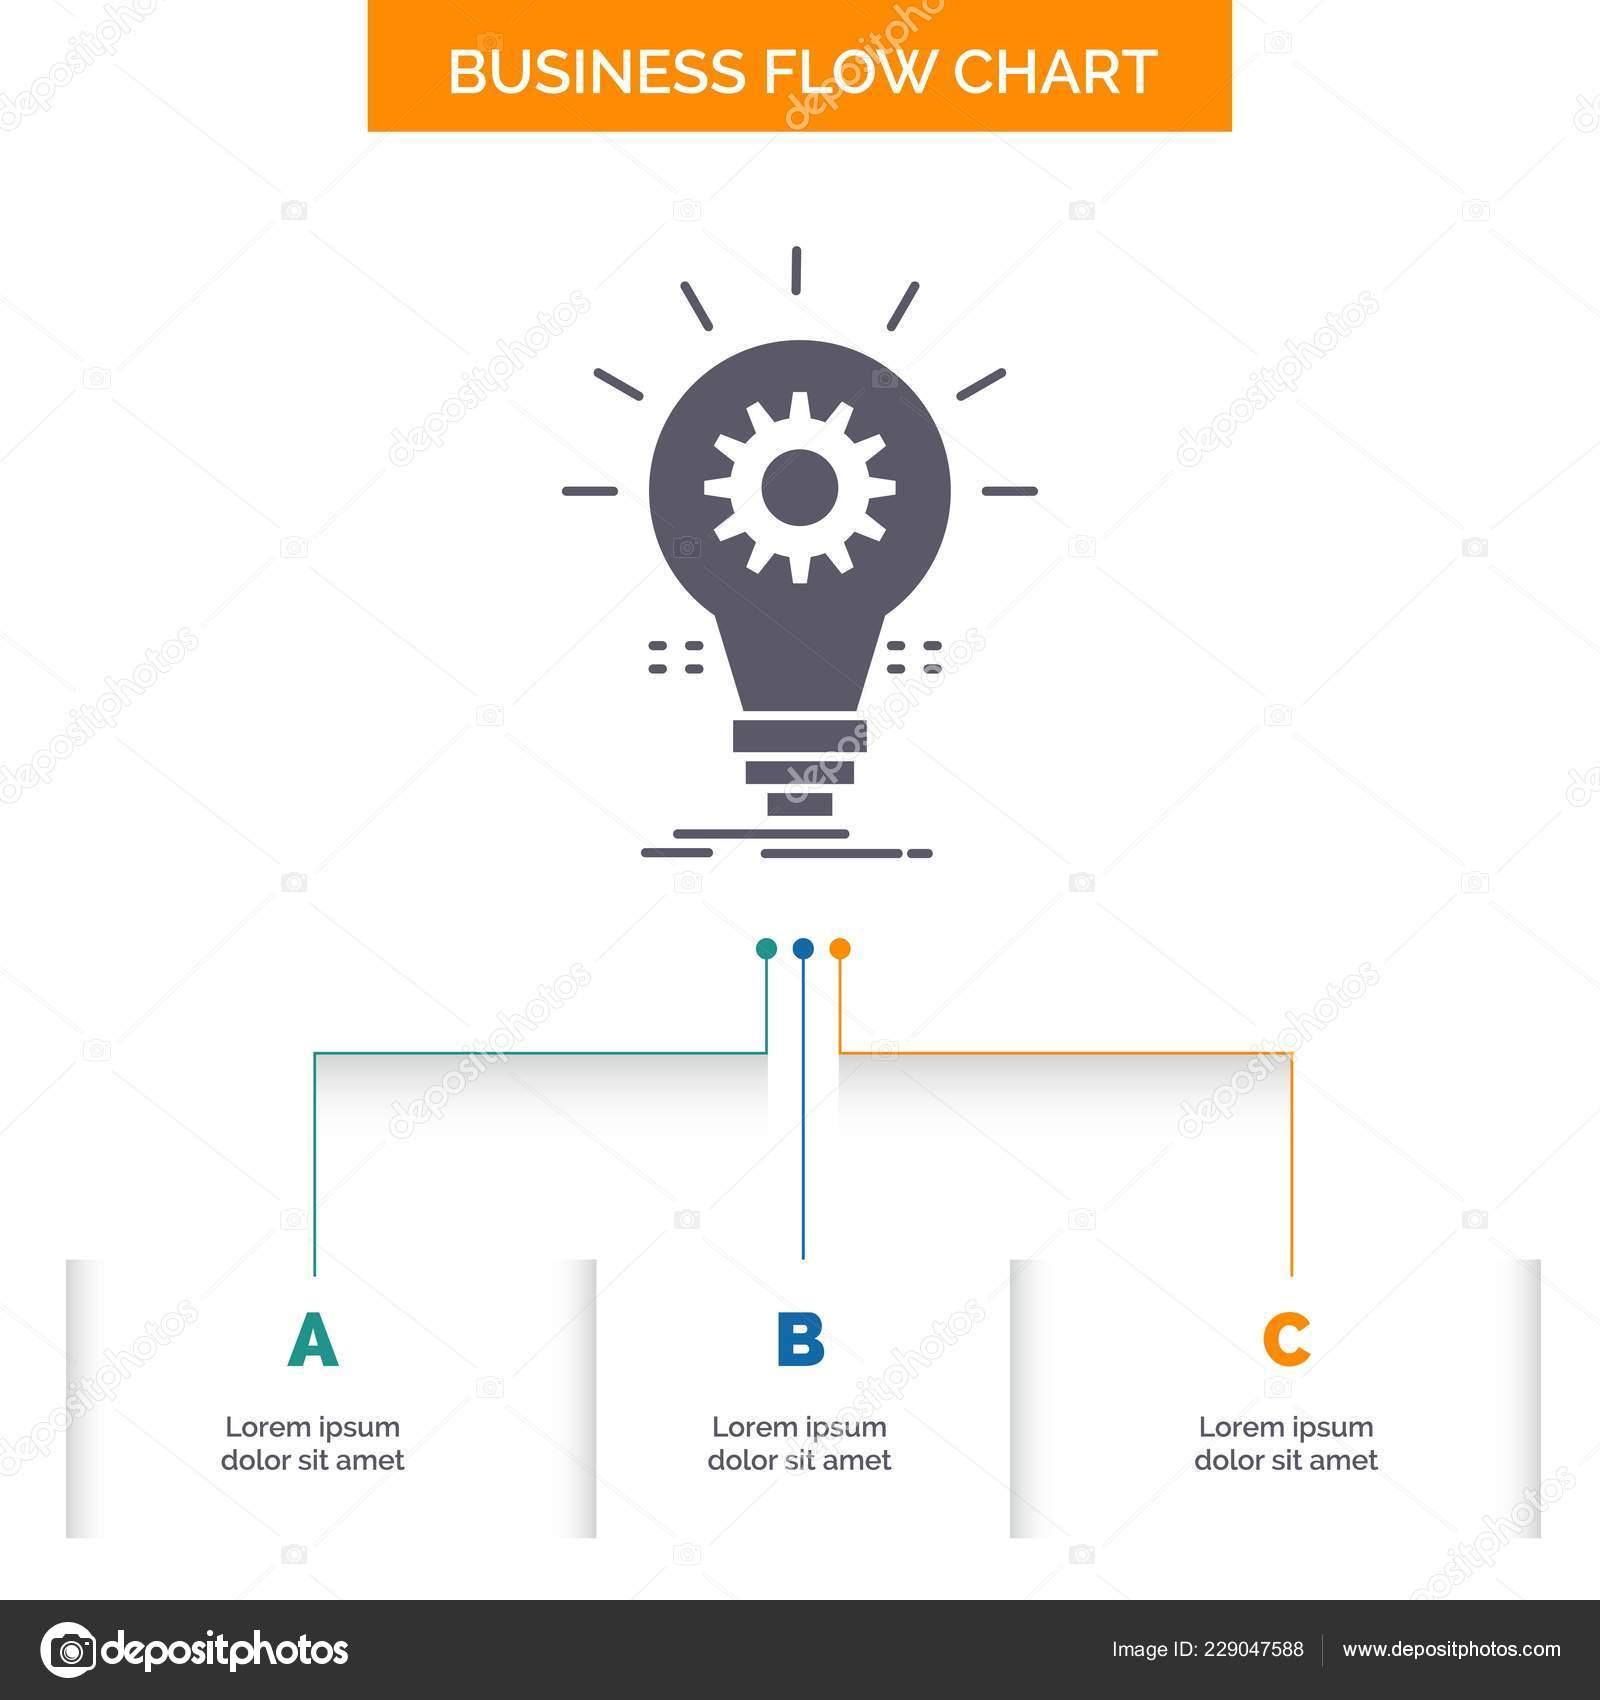 бизнес план пример магазина одежды